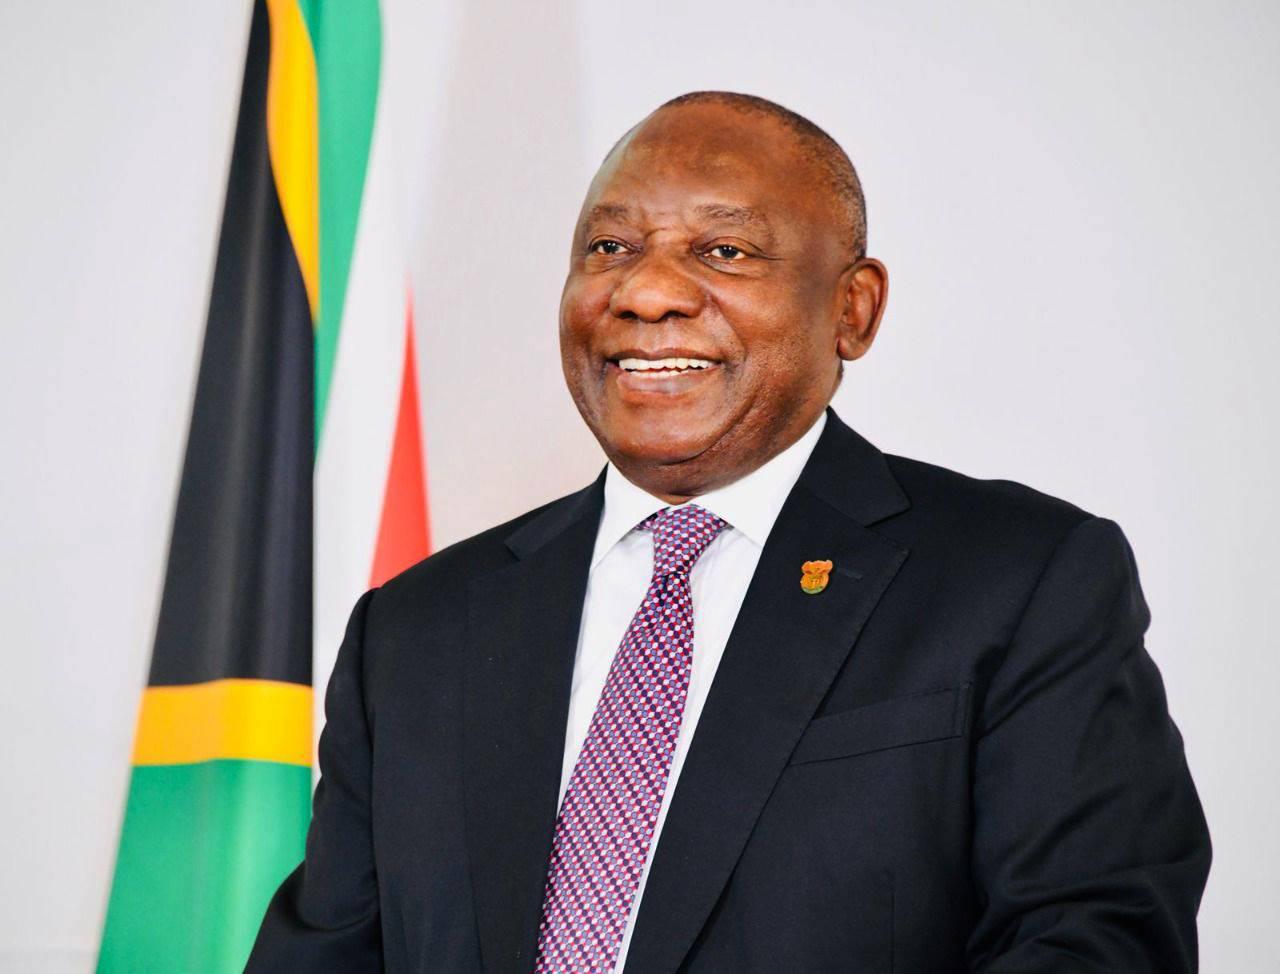 President Cyril Ramaphosa allegedly gave national commissioner of correctional services Arthur Fraser the green light to authorise the release of former president Jacob Zuma.  Photo: Siyabulela Duda/GCIS